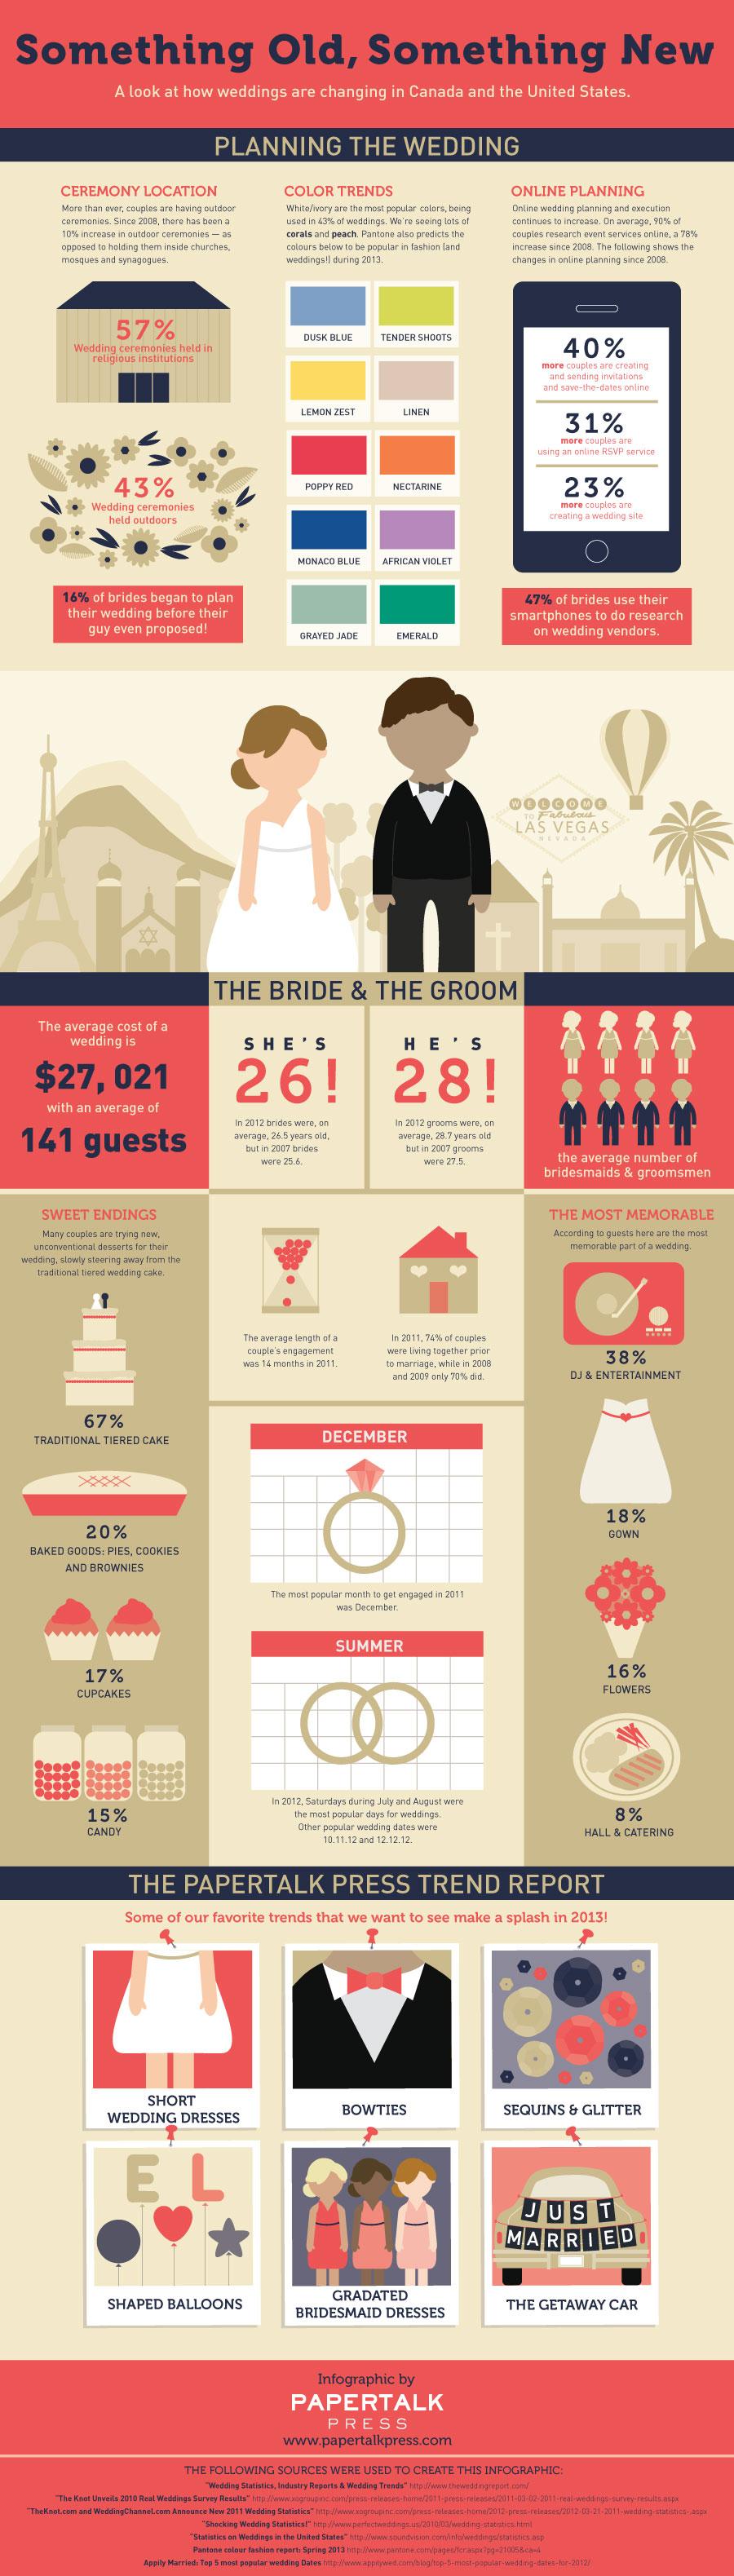 Online Planning Your Wedding